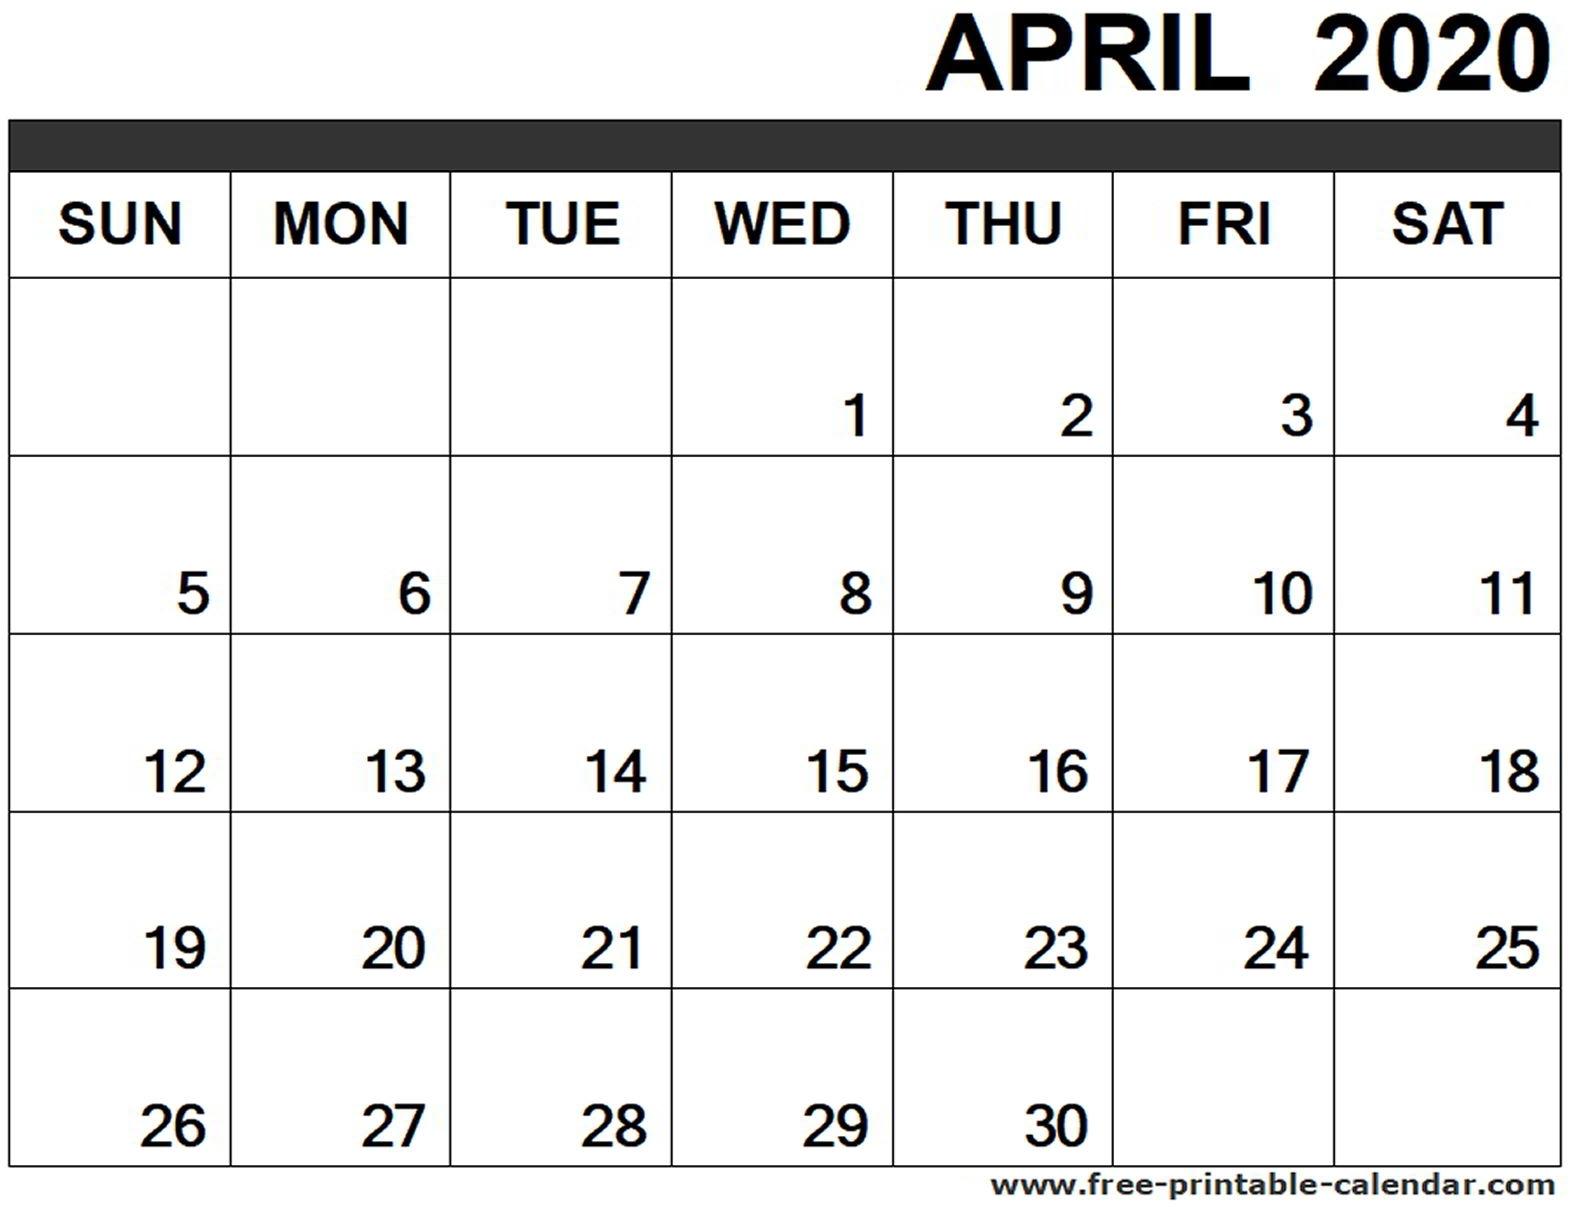 April 2020 Calendar Printable - Free-Printable-Calendar